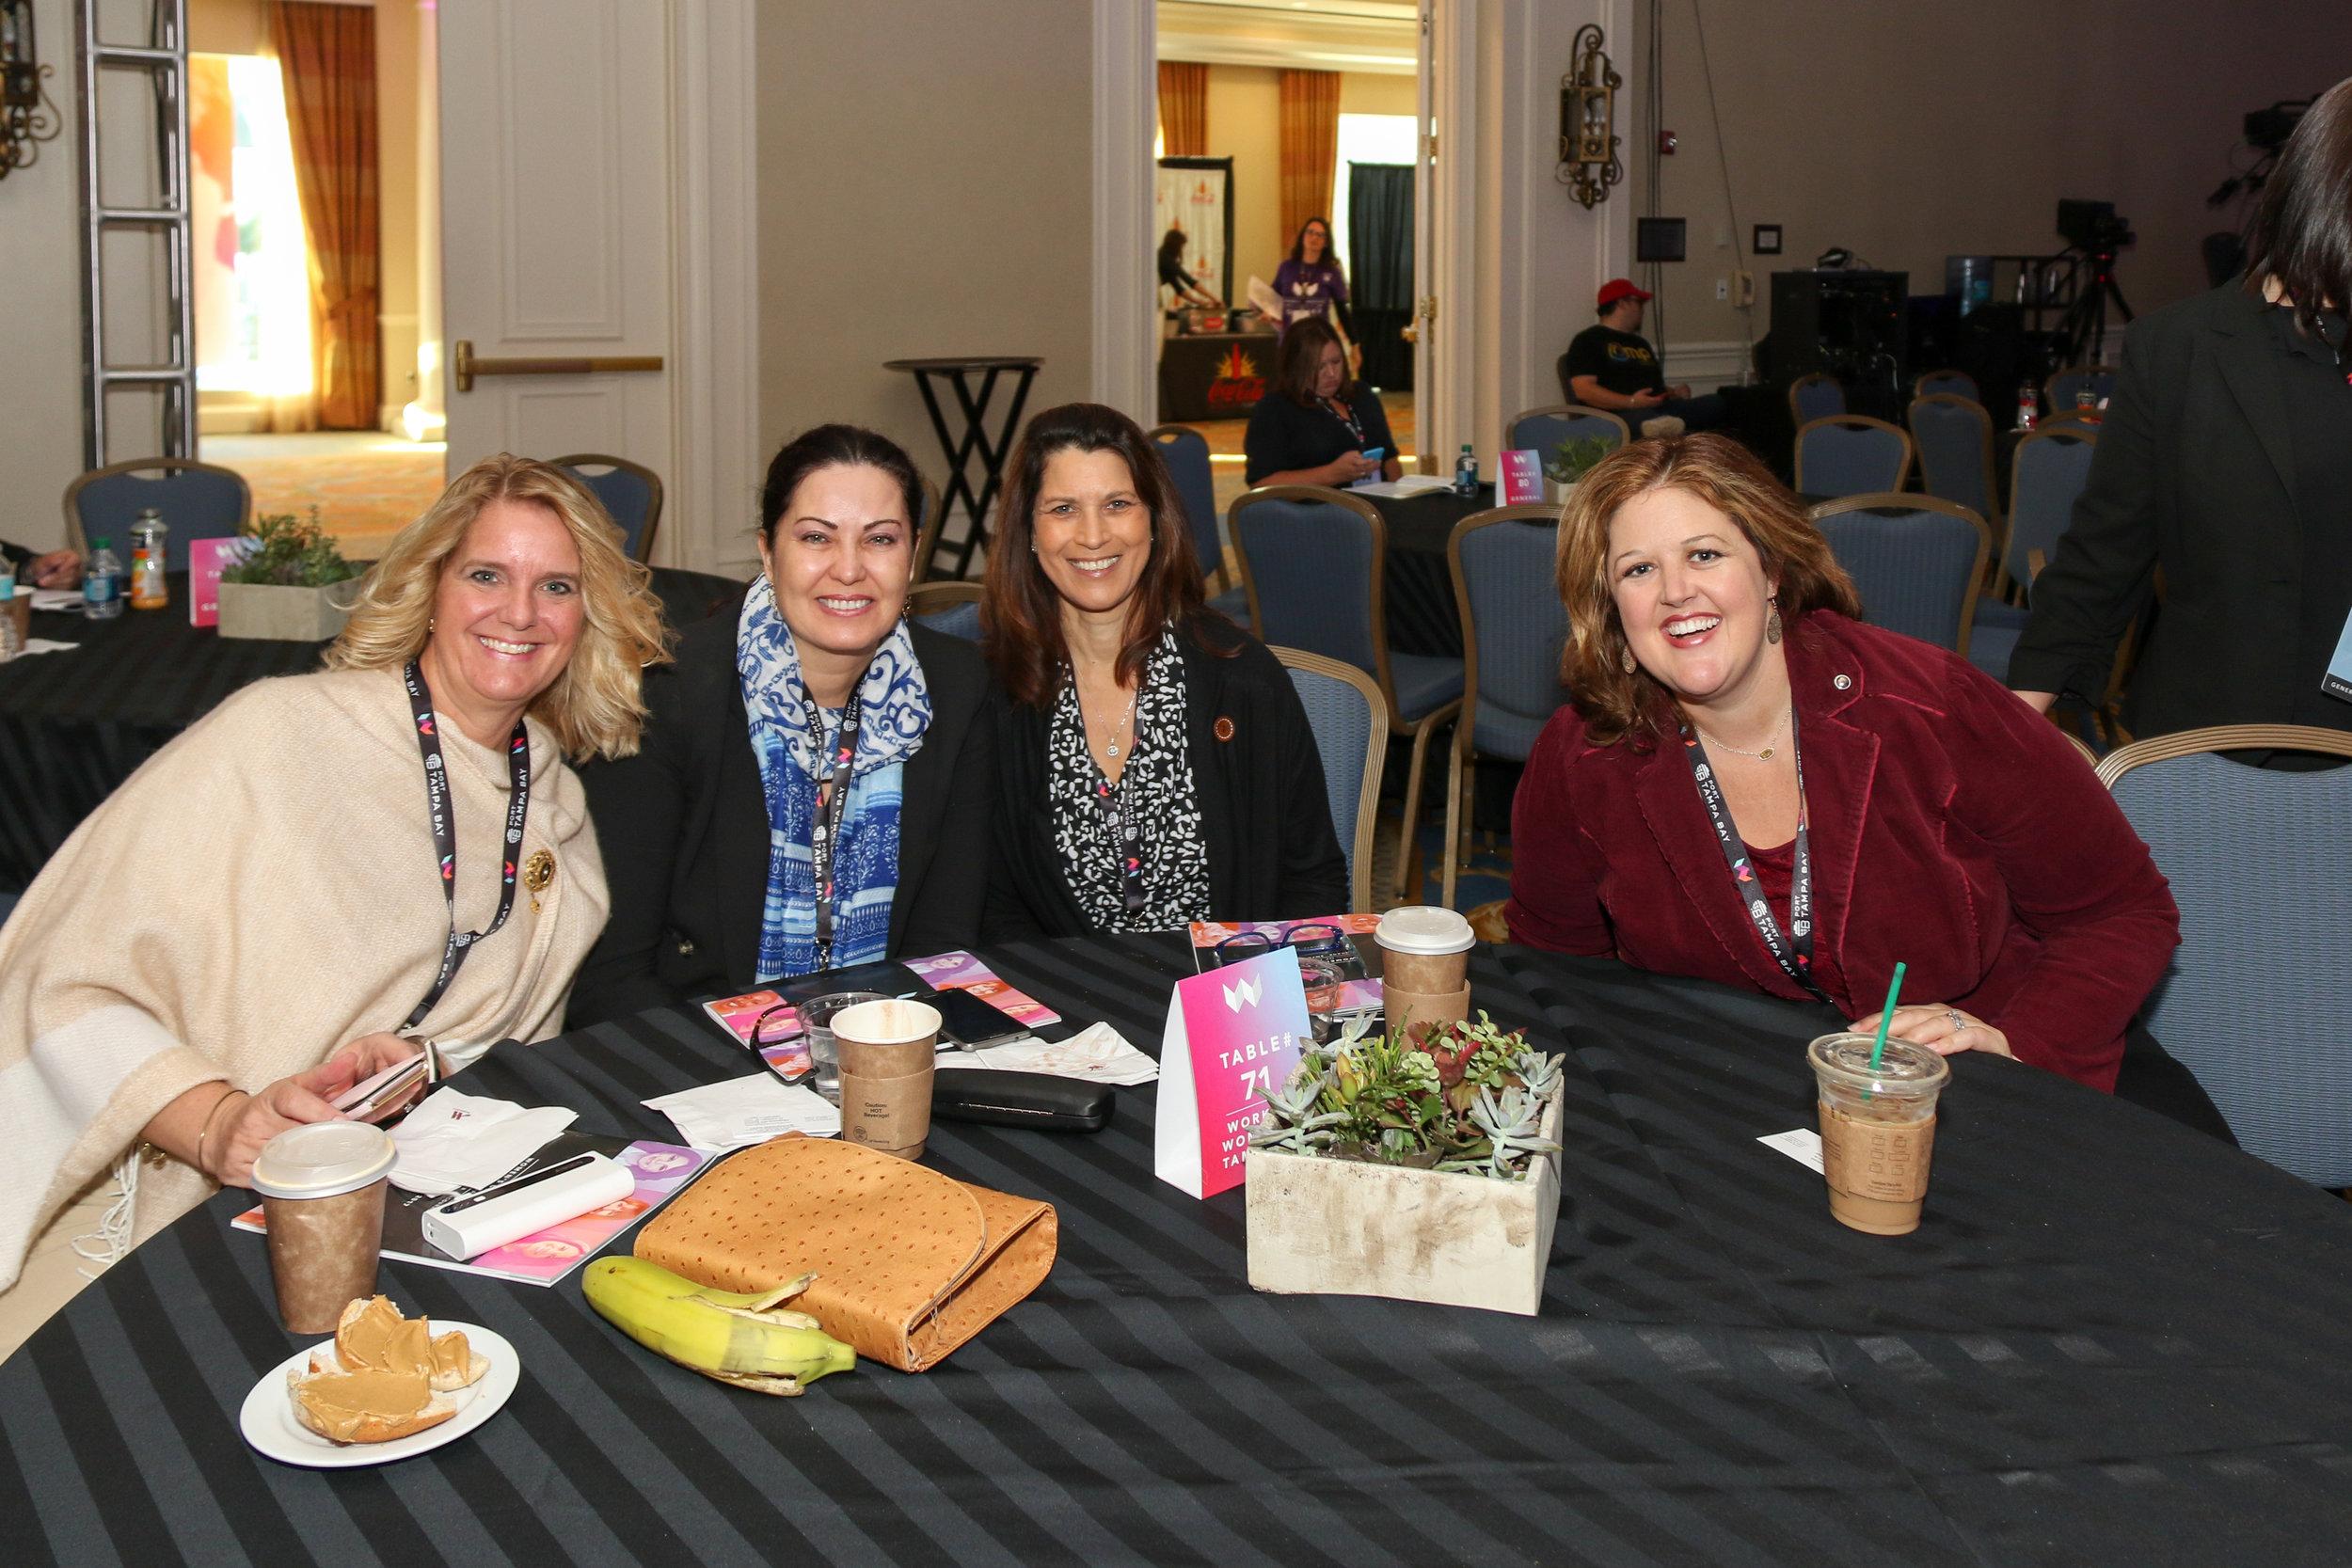 066_WomensConference_10-26-17.jpg